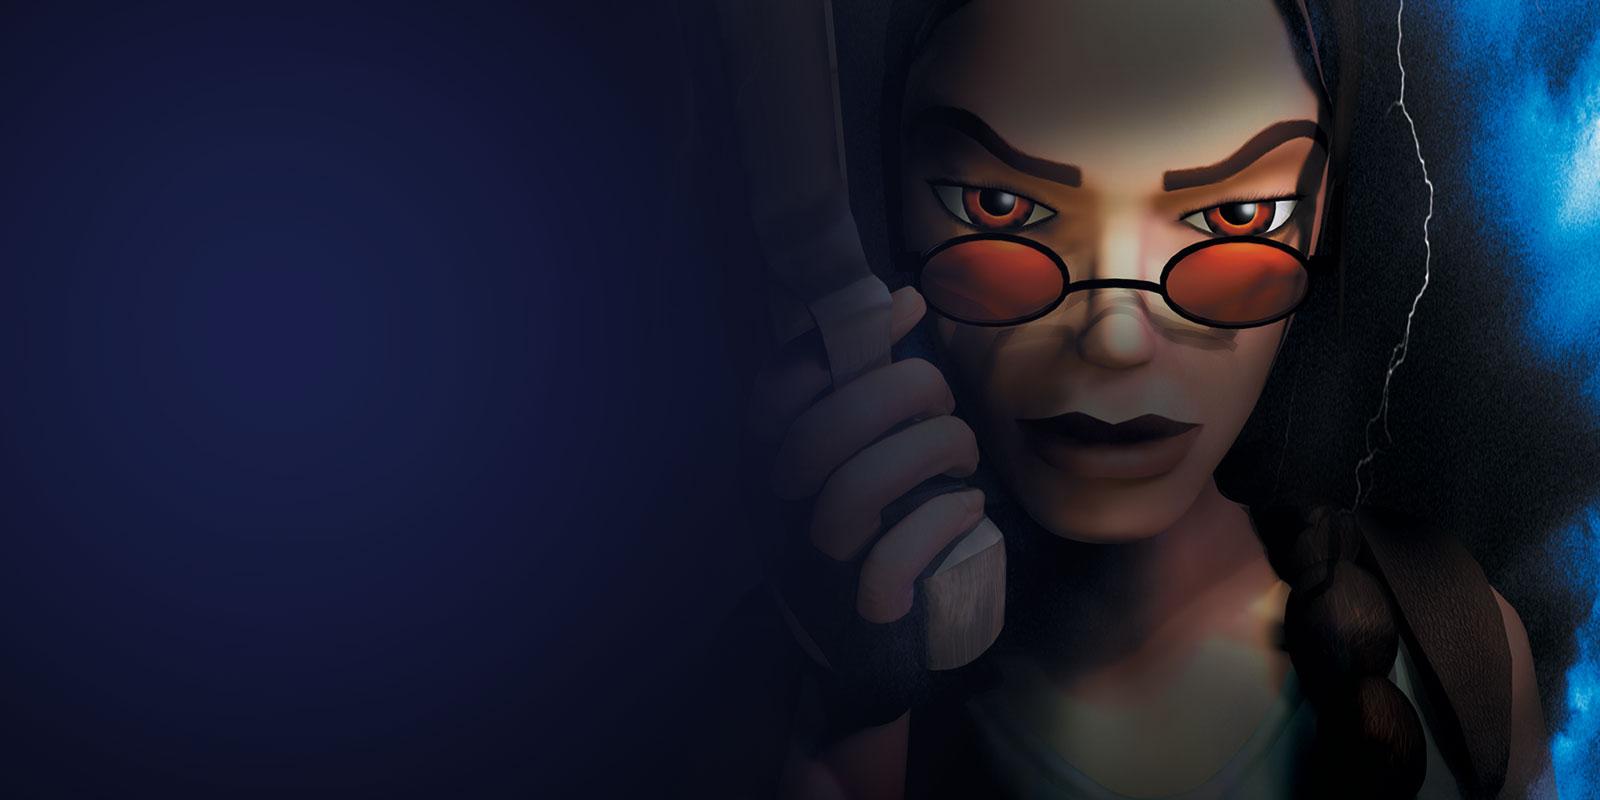 Les personnages de Tomb Raider 5